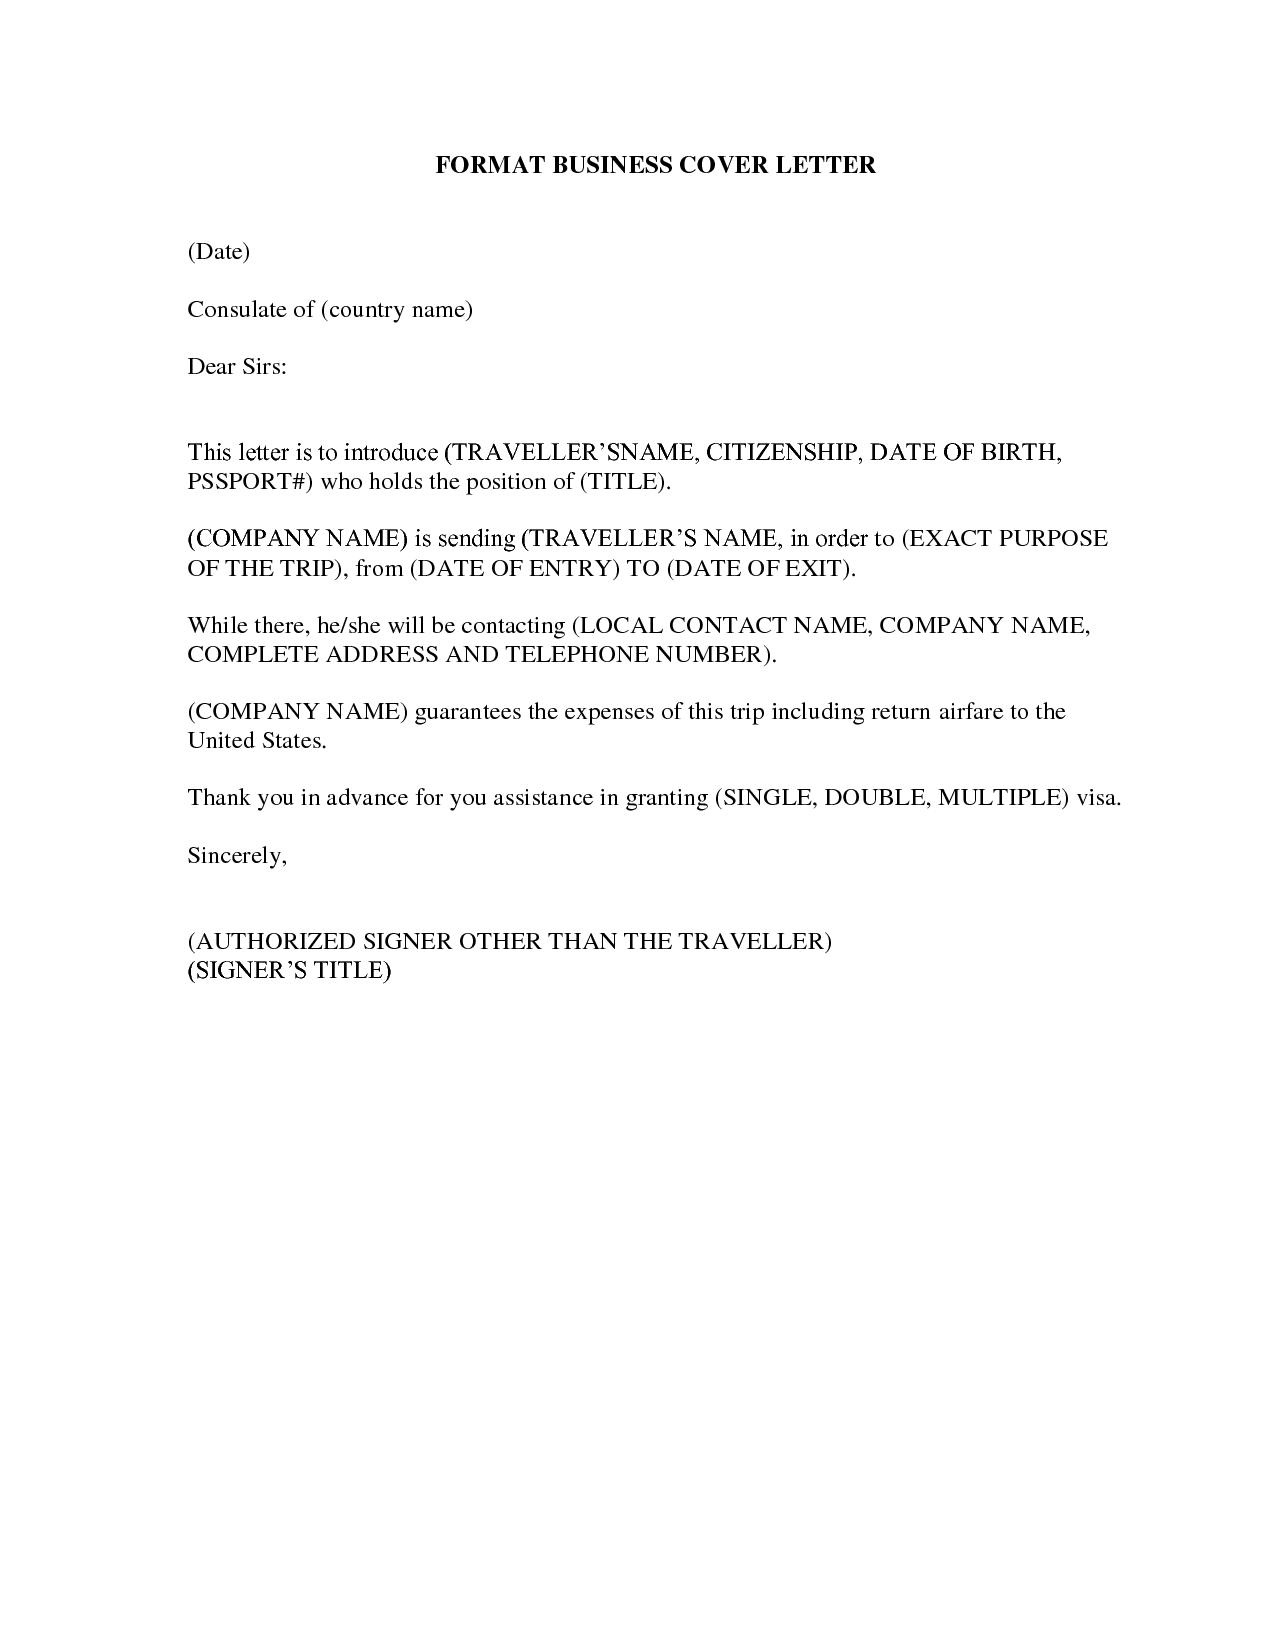 Official Cover Letter Format Formal Business Job Application Basic